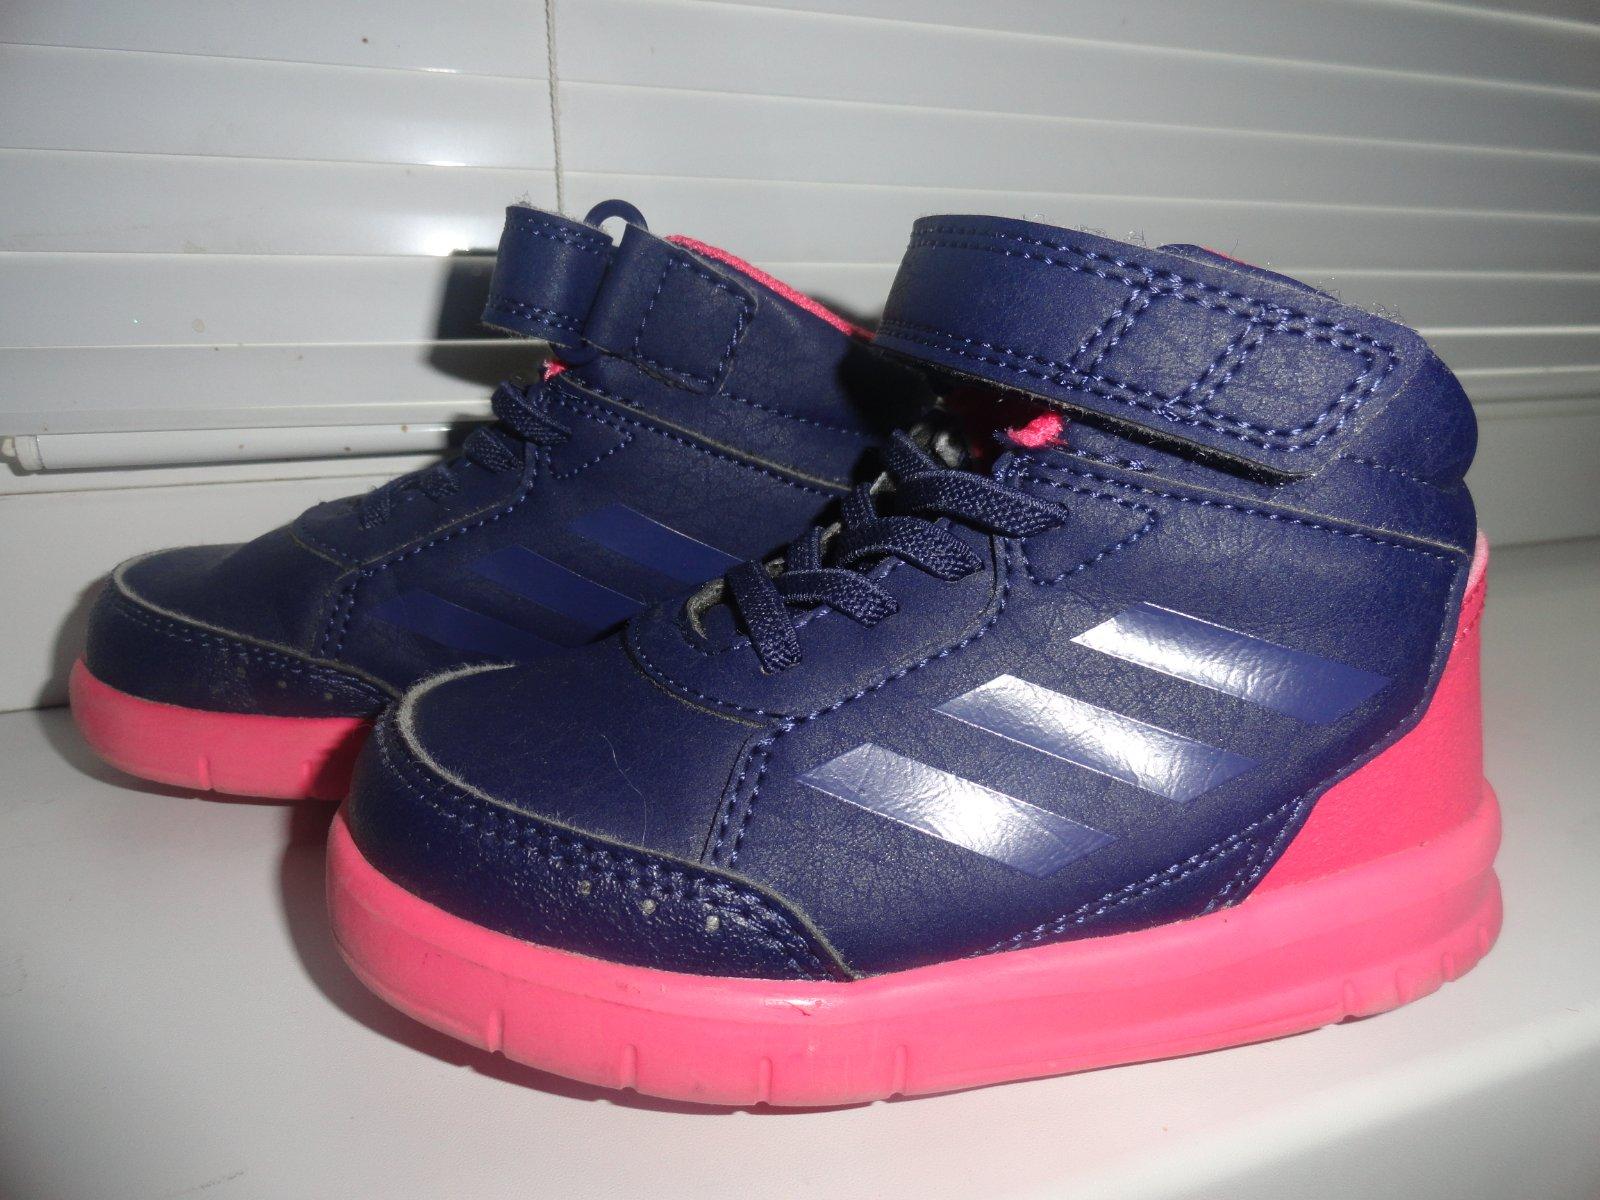 fce4d045723 Členkové tenisky adidas